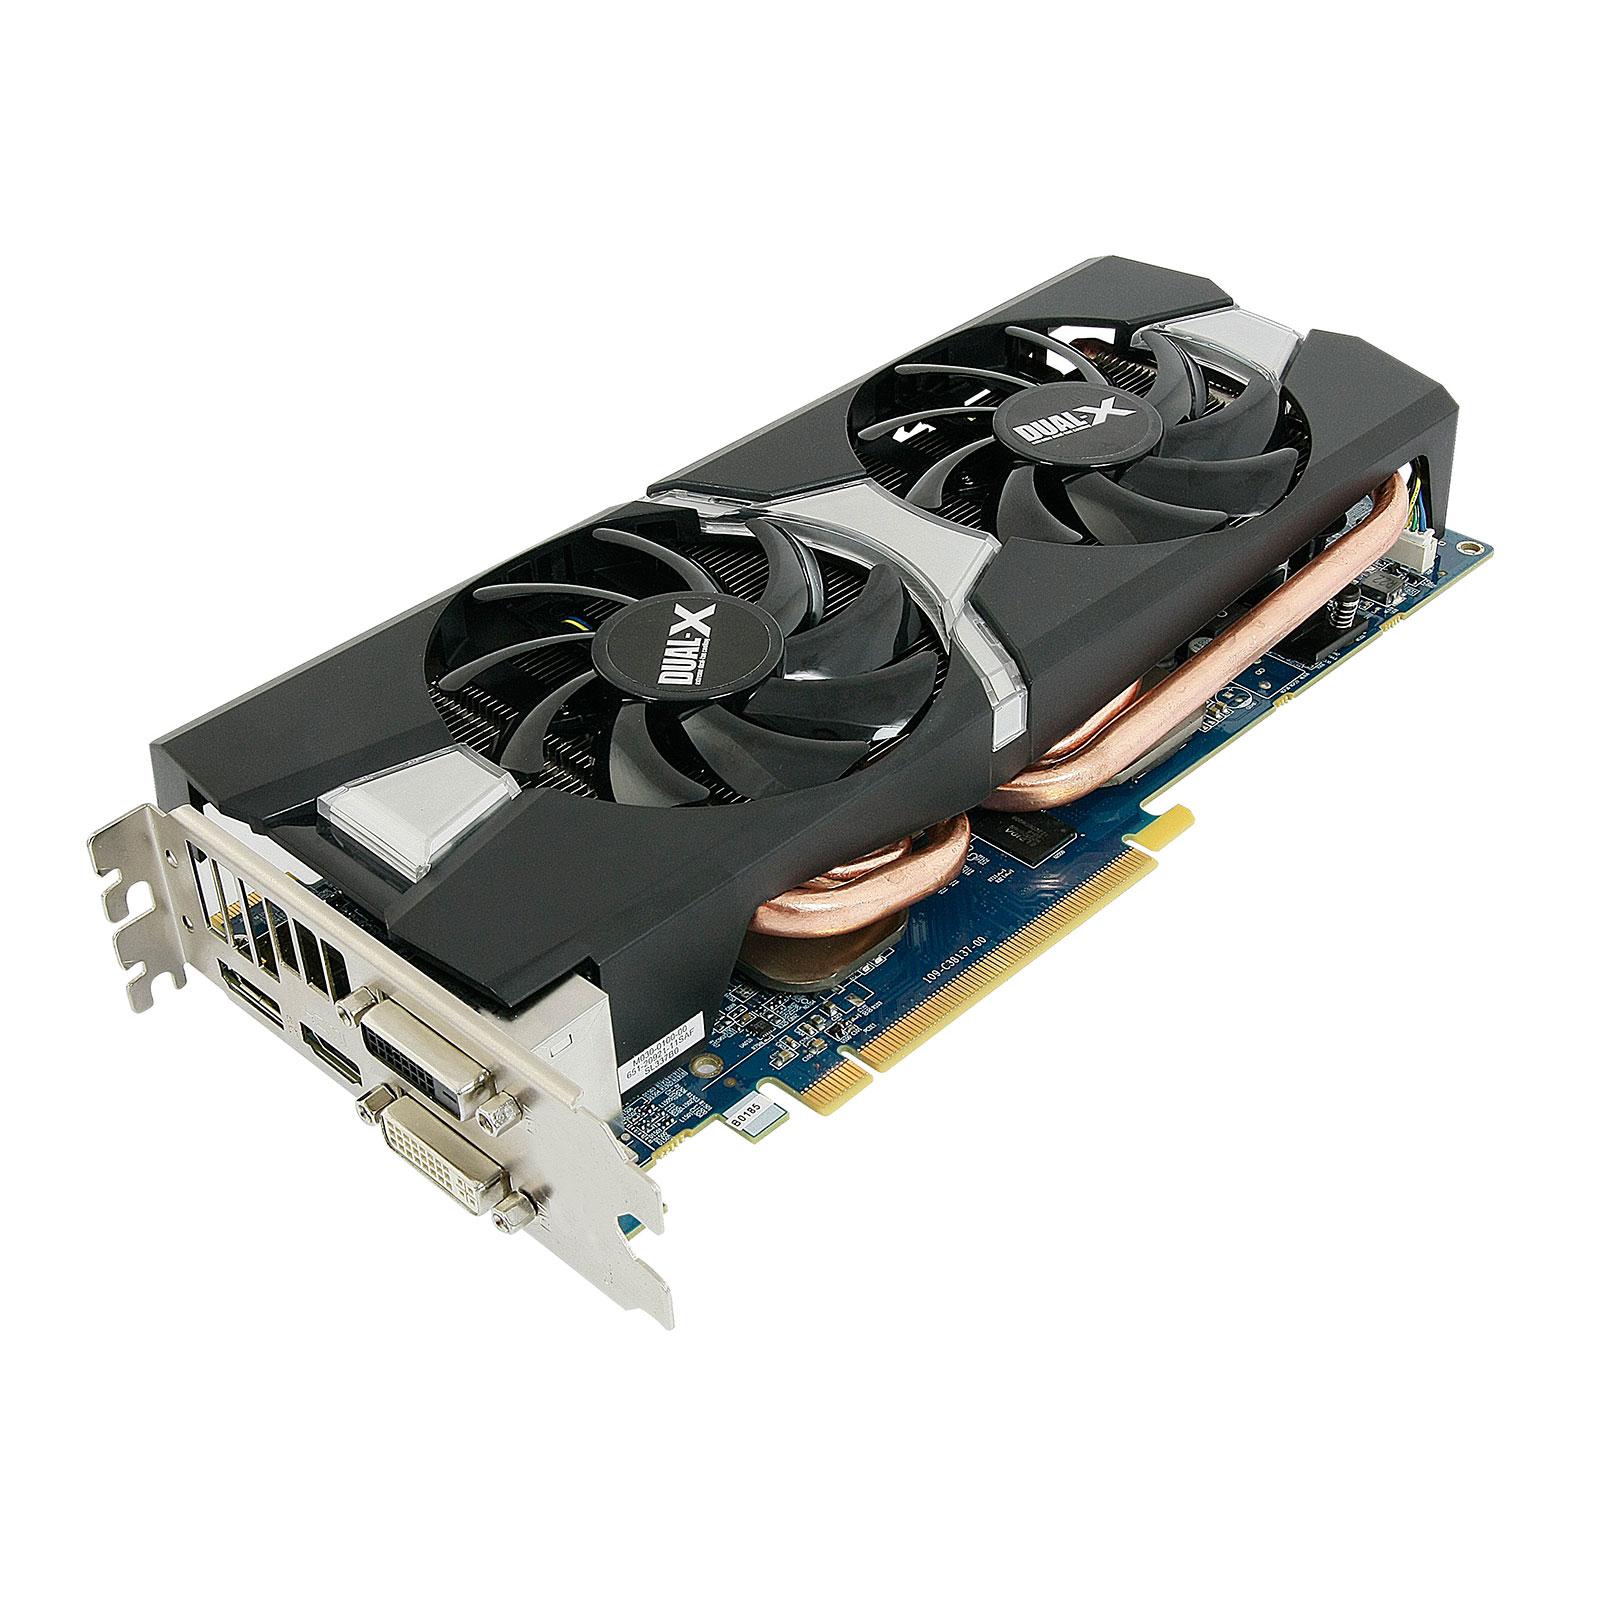 Carte graphique Sapphire Radeon R9 280 Dual-X 3G GDDR5 OC 3 Go Dual DVI/HDMI/DisplayPort - PCI Express (AMD Radeon R9 280)